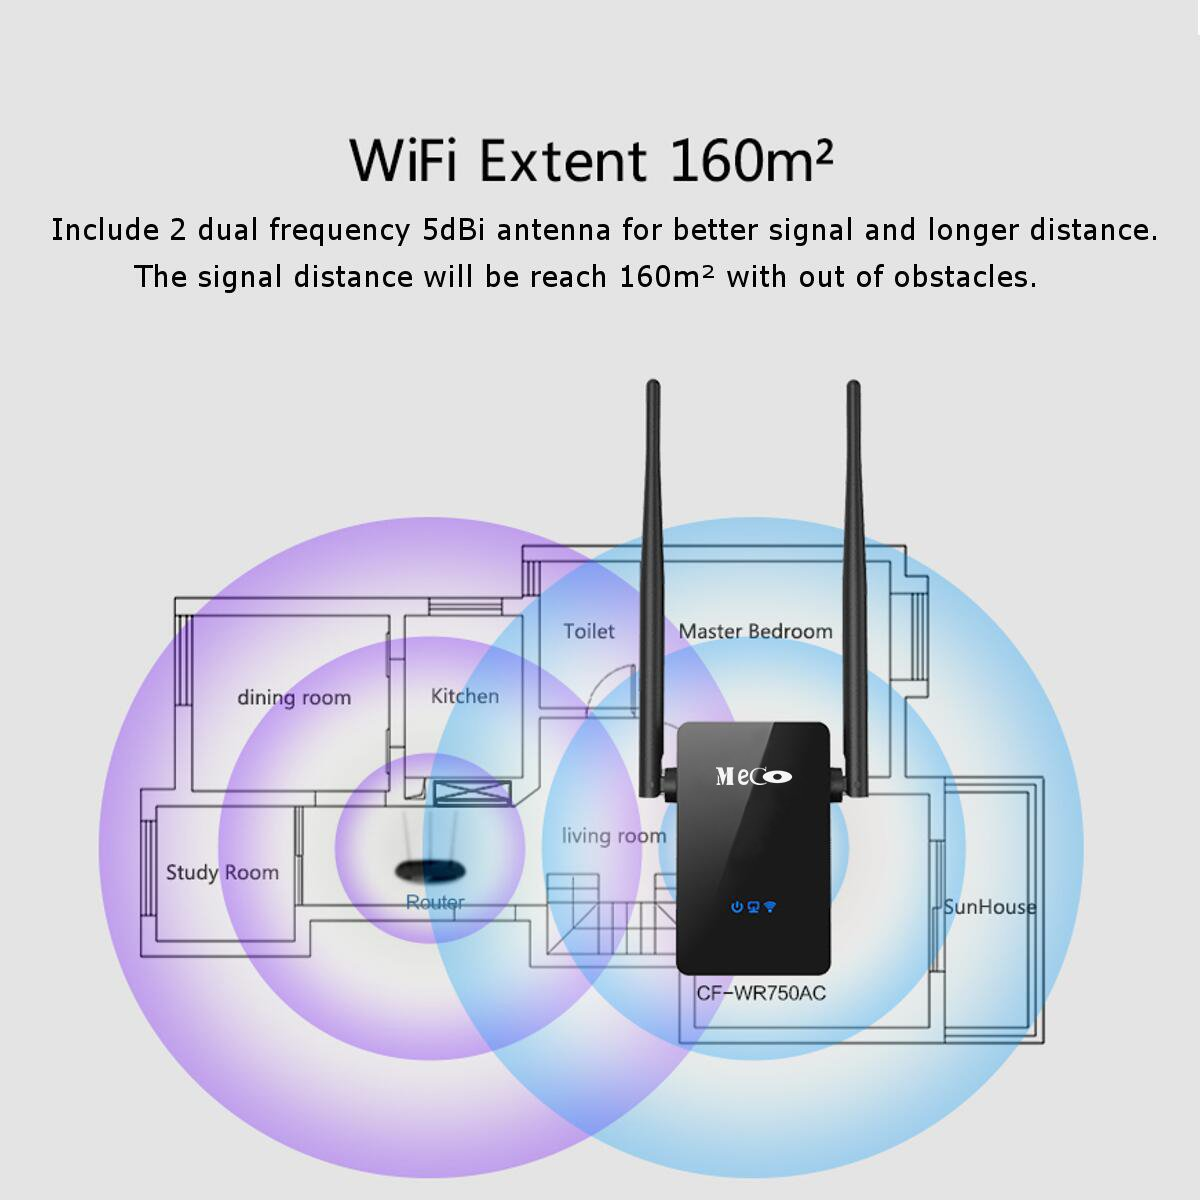 WLAN Repeater, MECO Zwei lange Antennen Wifi Range: Amazon.de ...